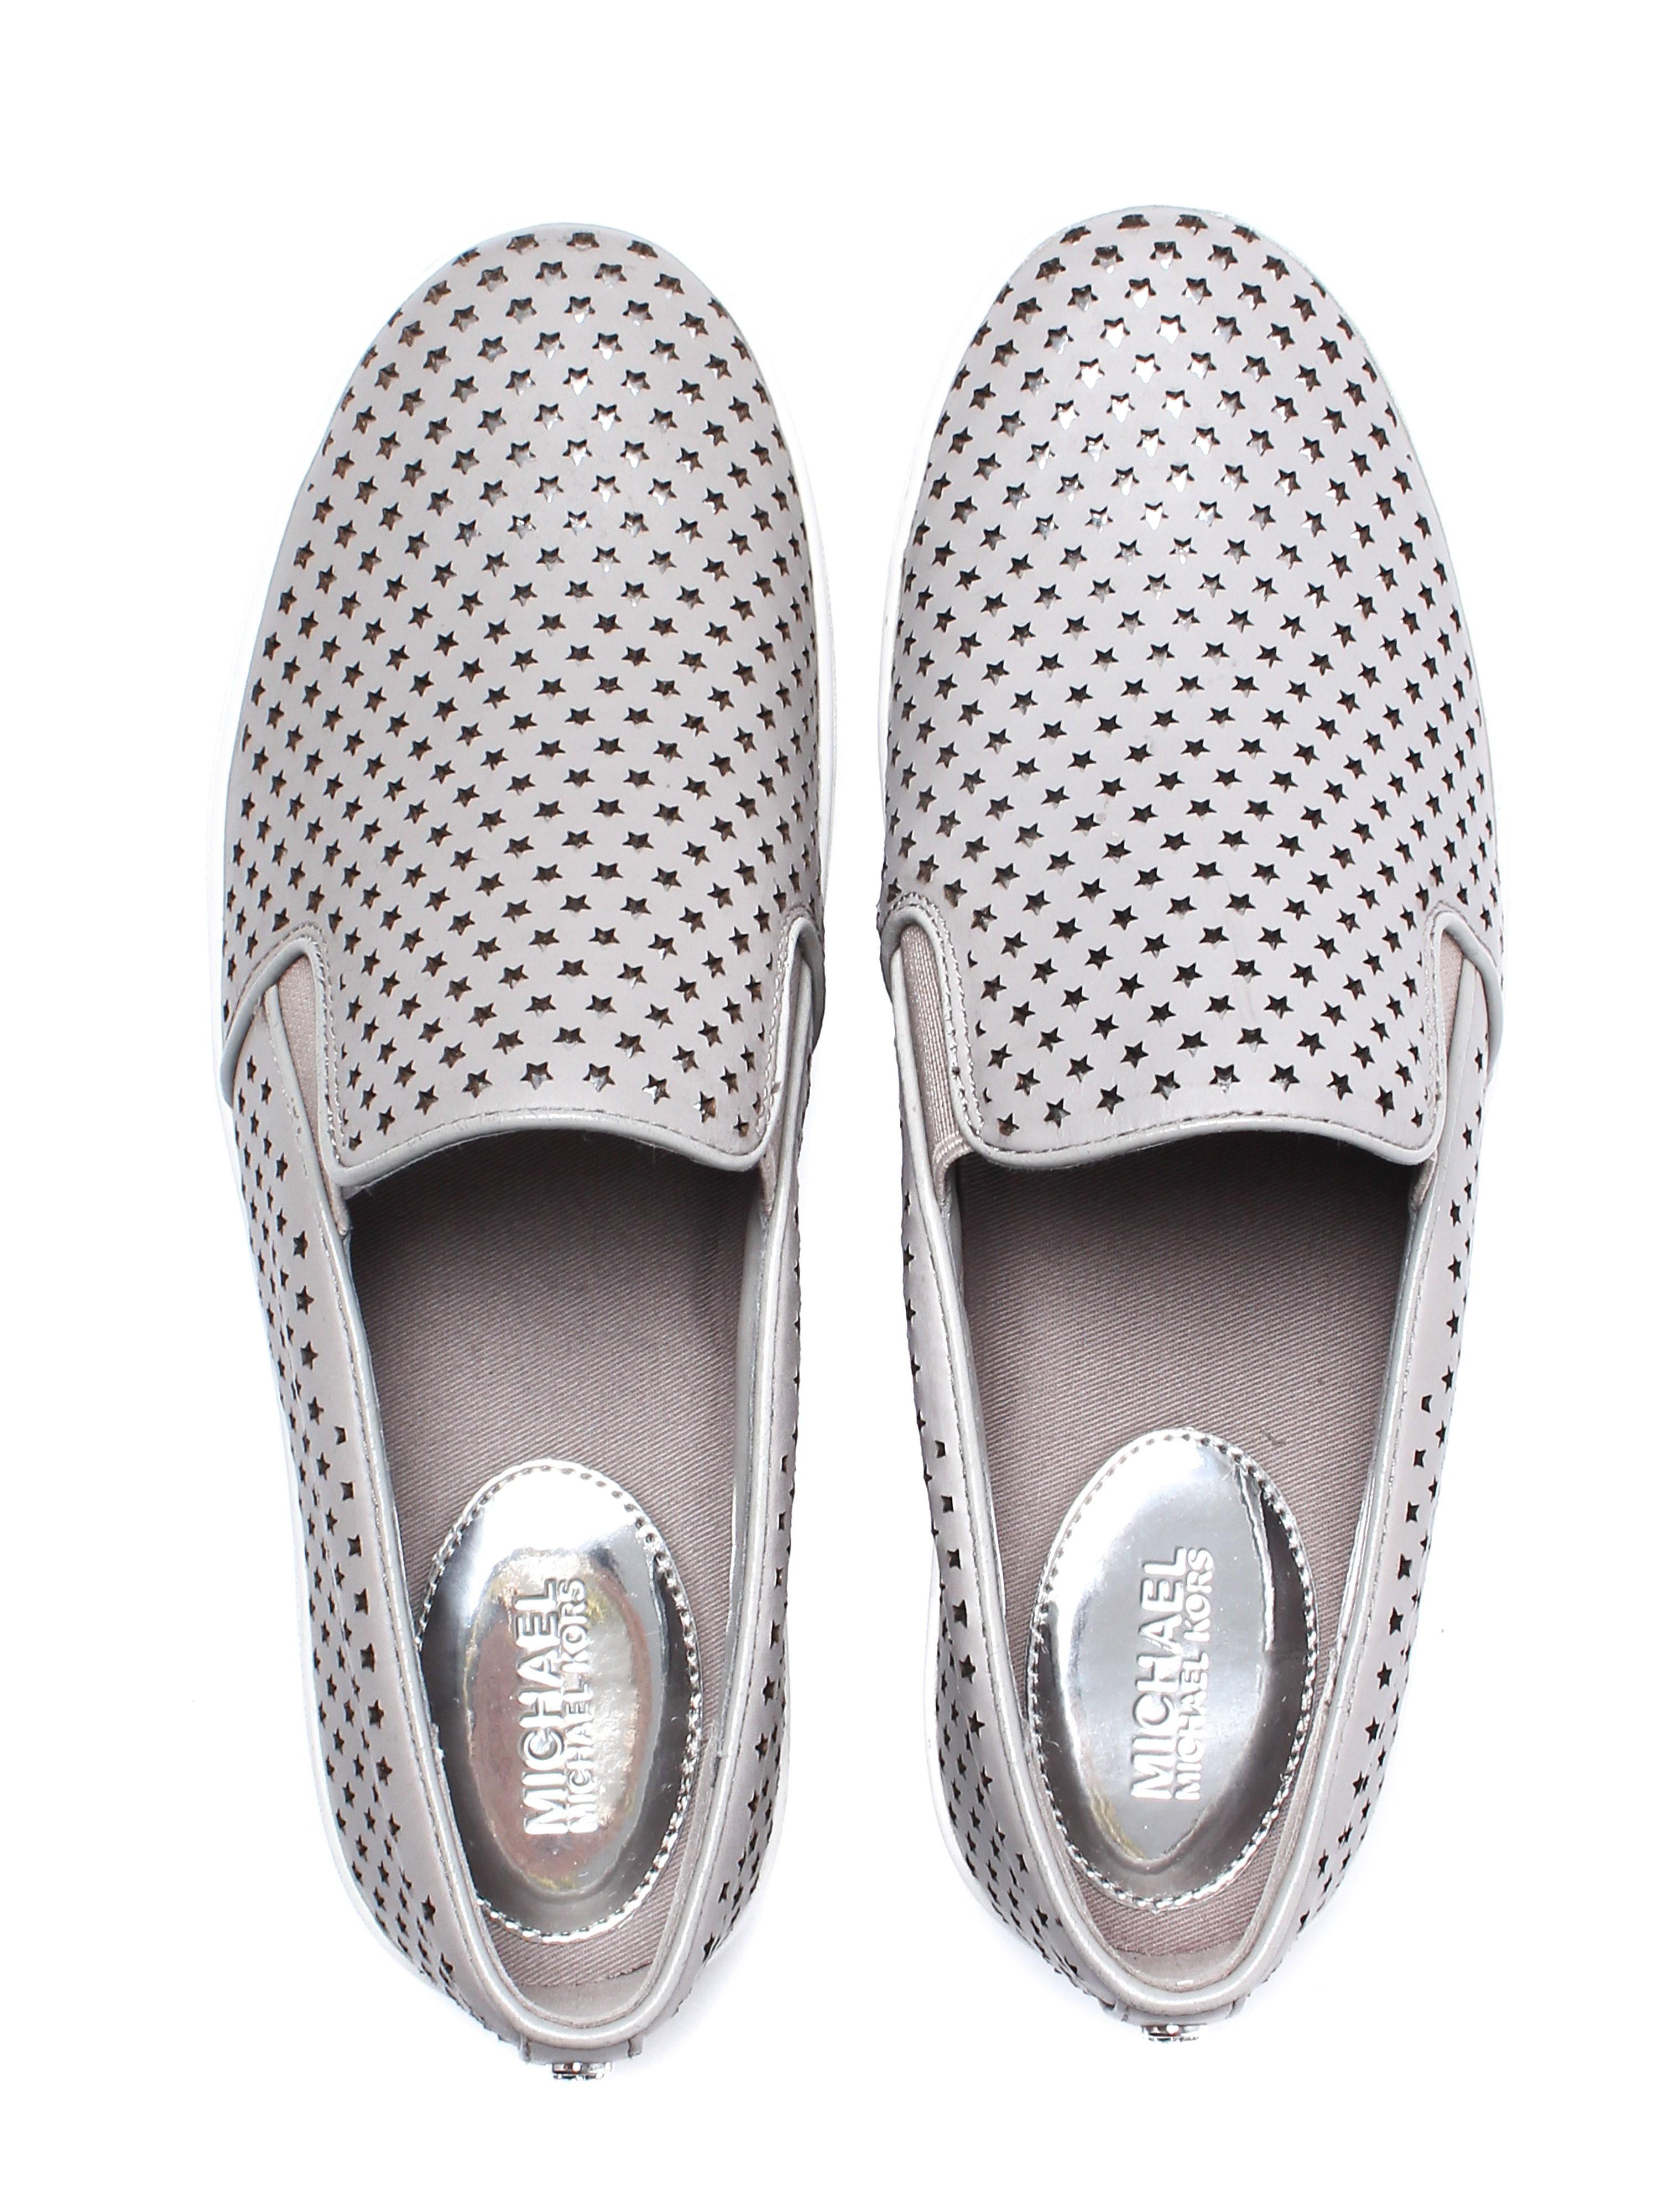 Michael Michael Kors Women's Keaton Slip On Trainers - Pearl Grey Leather